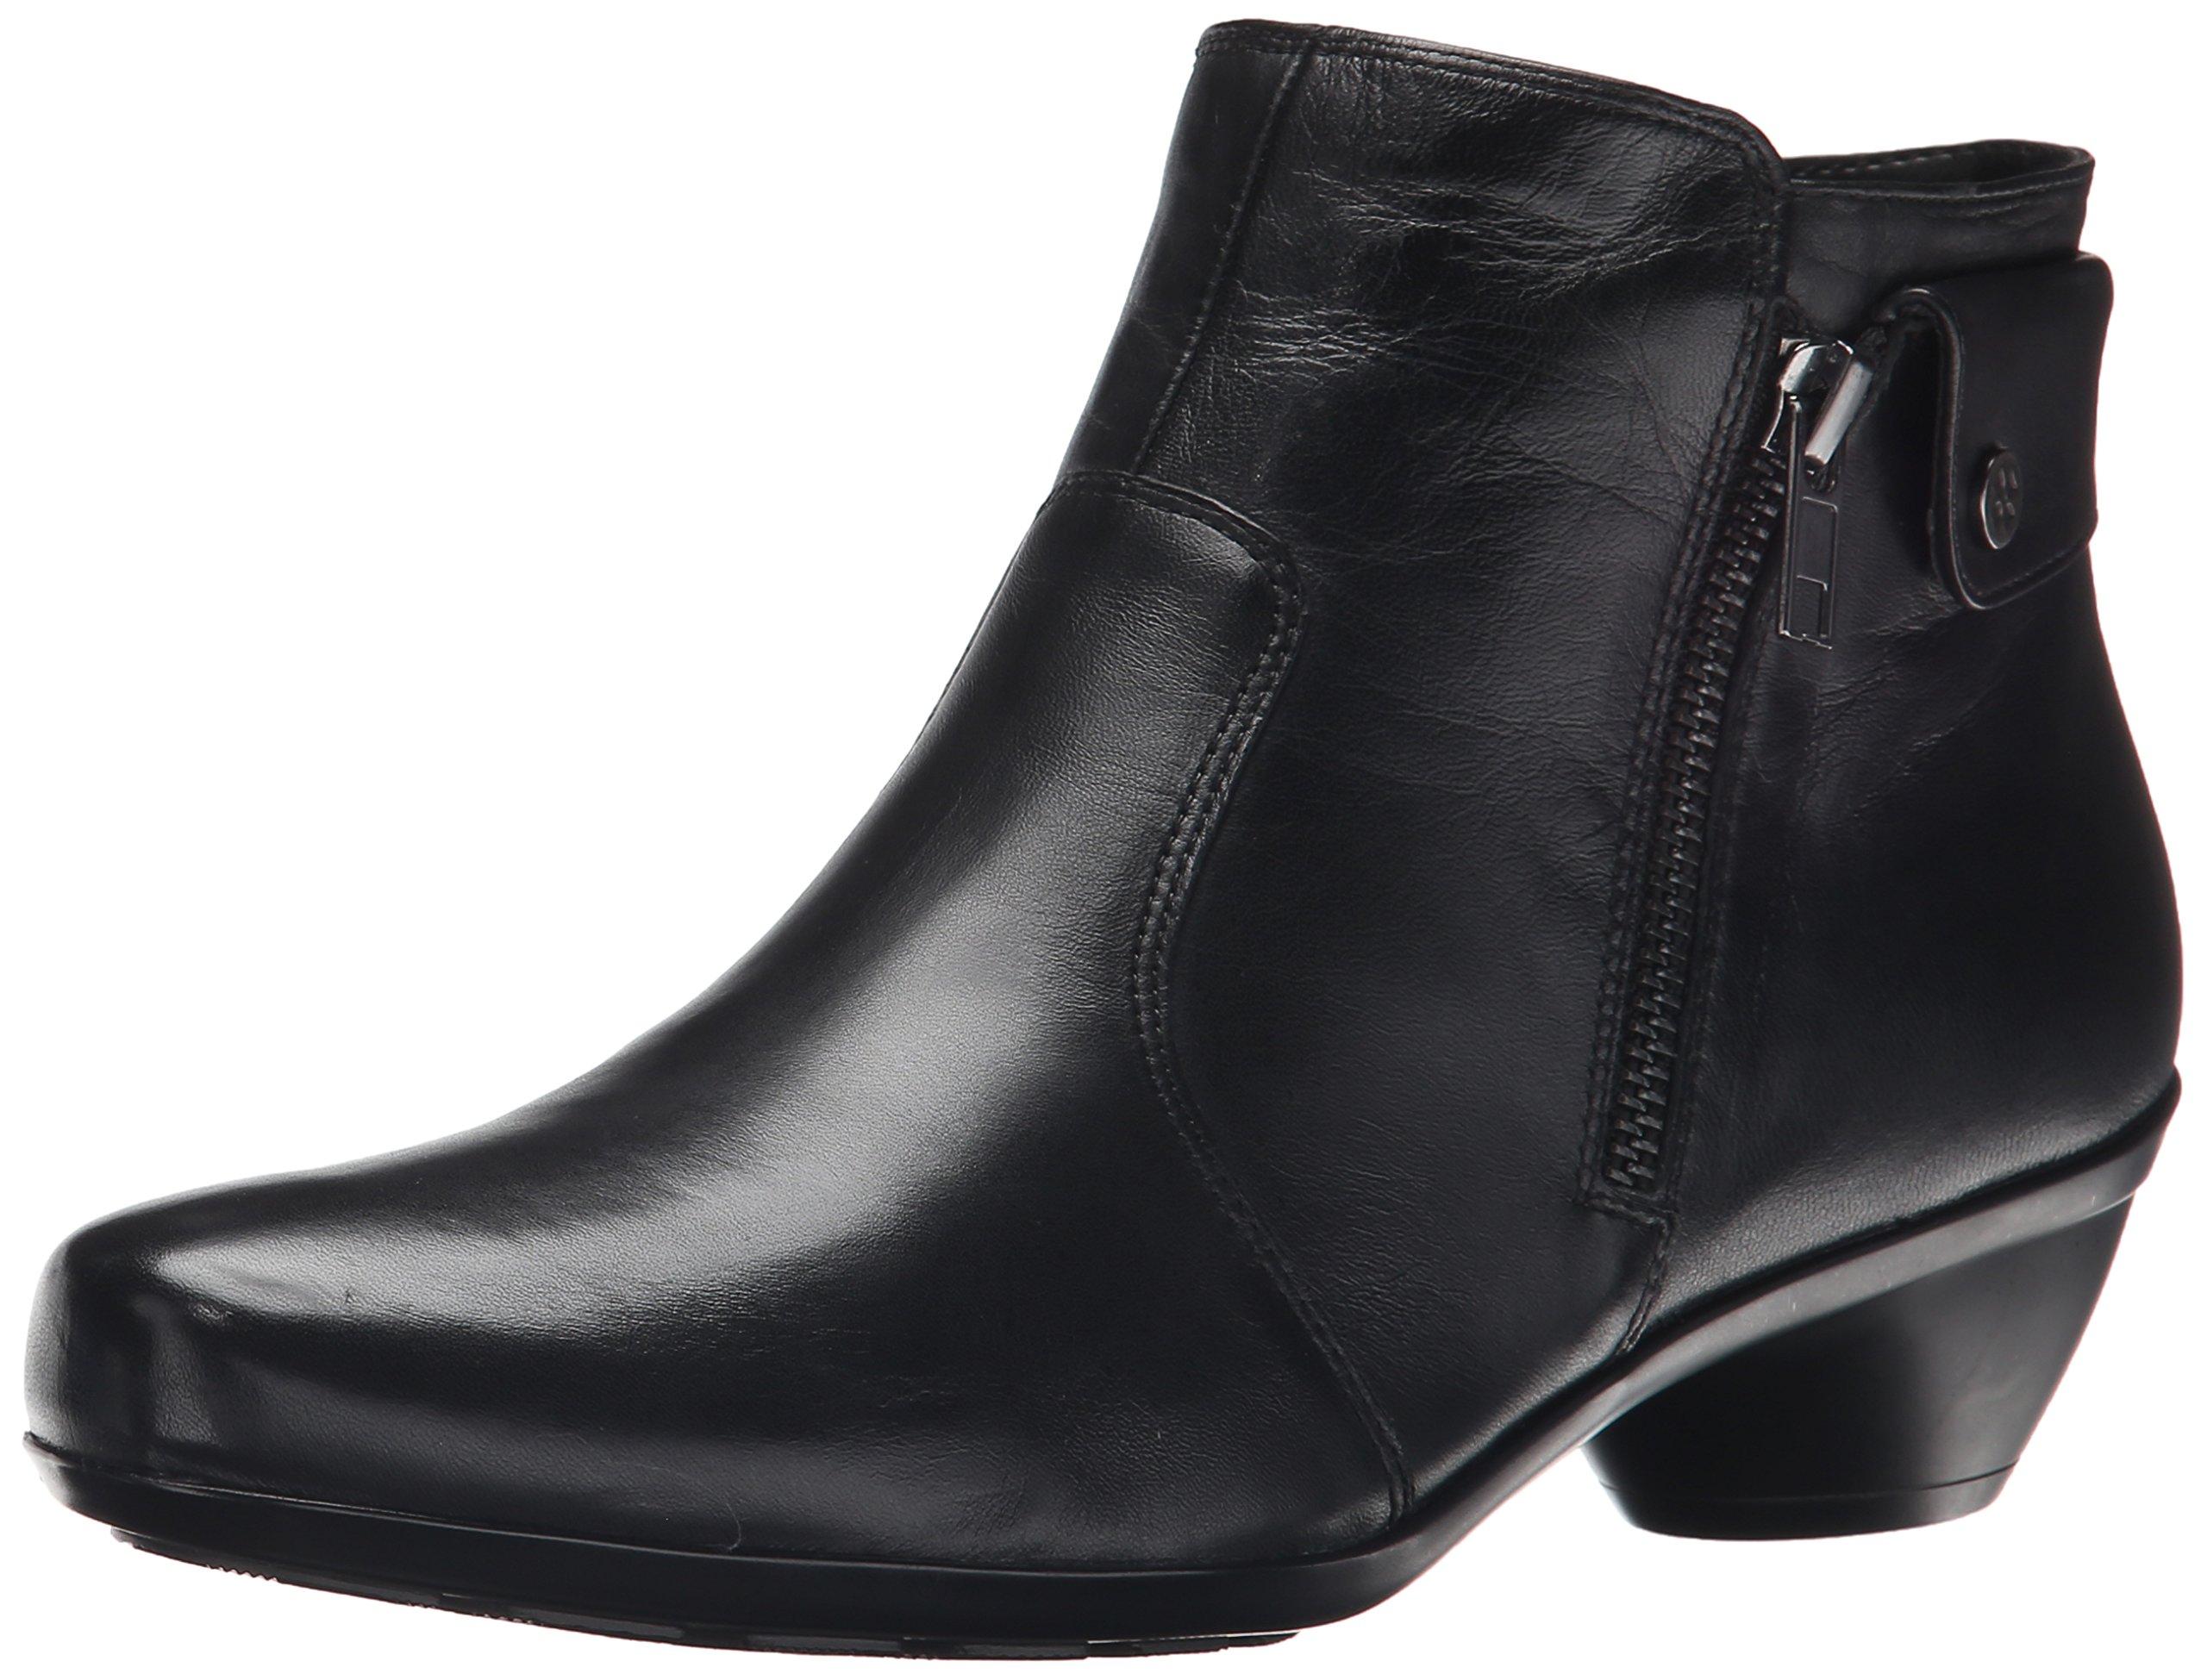 Naturalizer Women's Haley Boot, Black, 9 M US